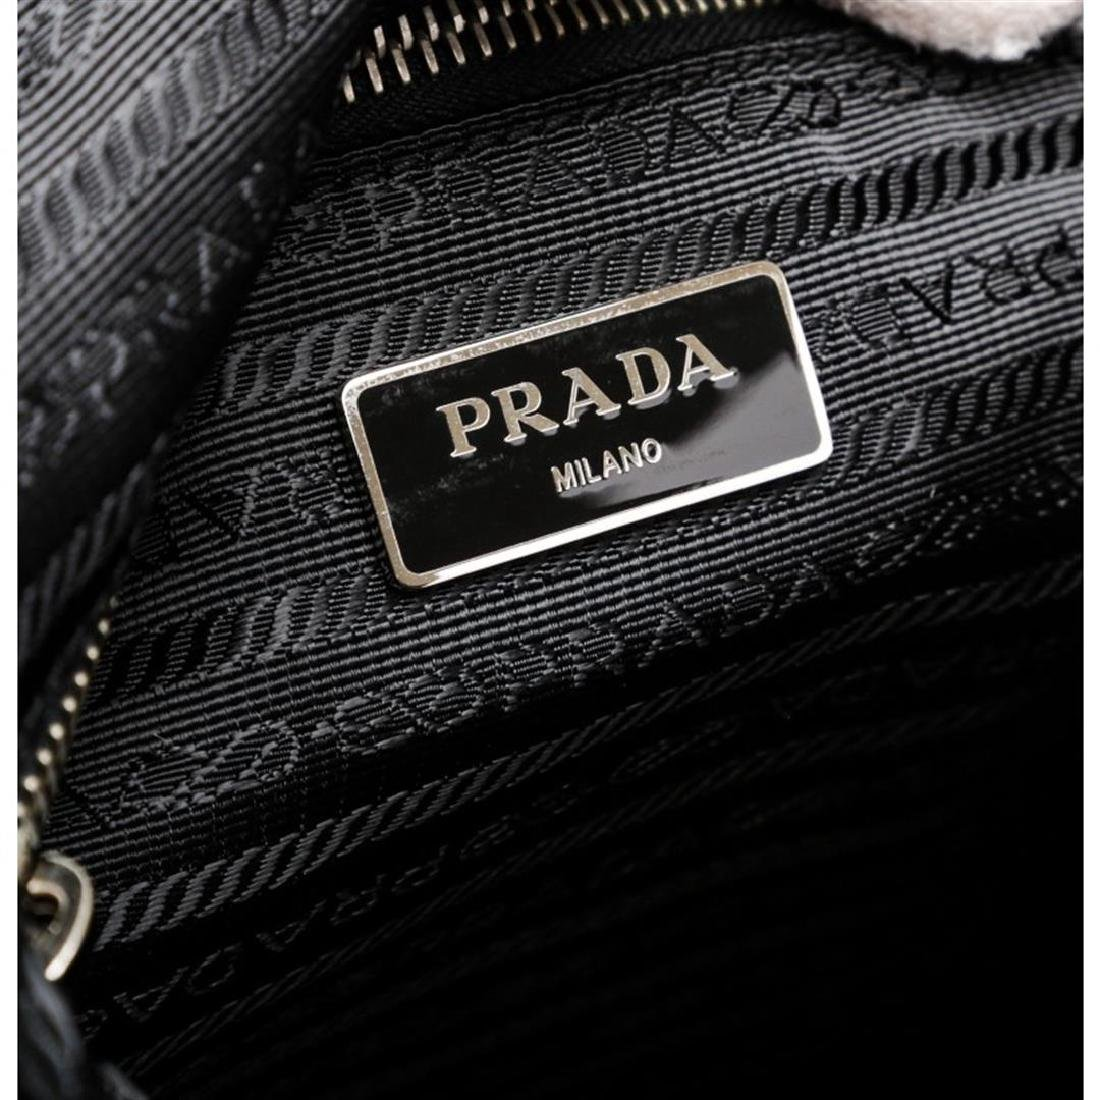 Prada Black Nylon Leather Long Tote Shoulder Bag - 6